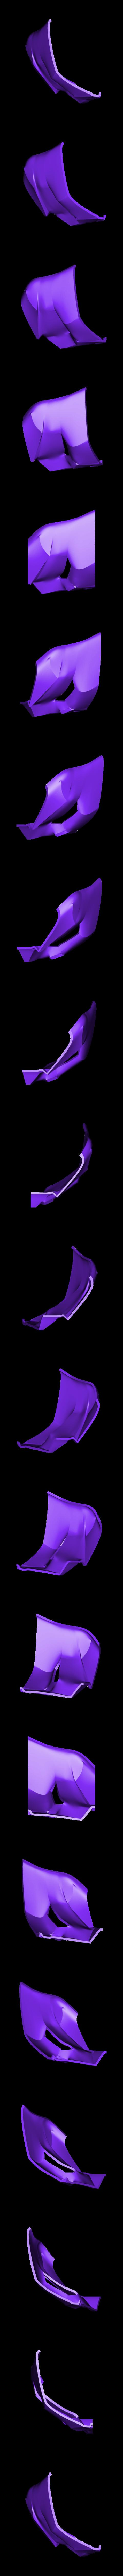 Part_3_v2.stl Download free STL file Kotor Sith Mask Star Wars • 3D printing model, VillainousPropShop